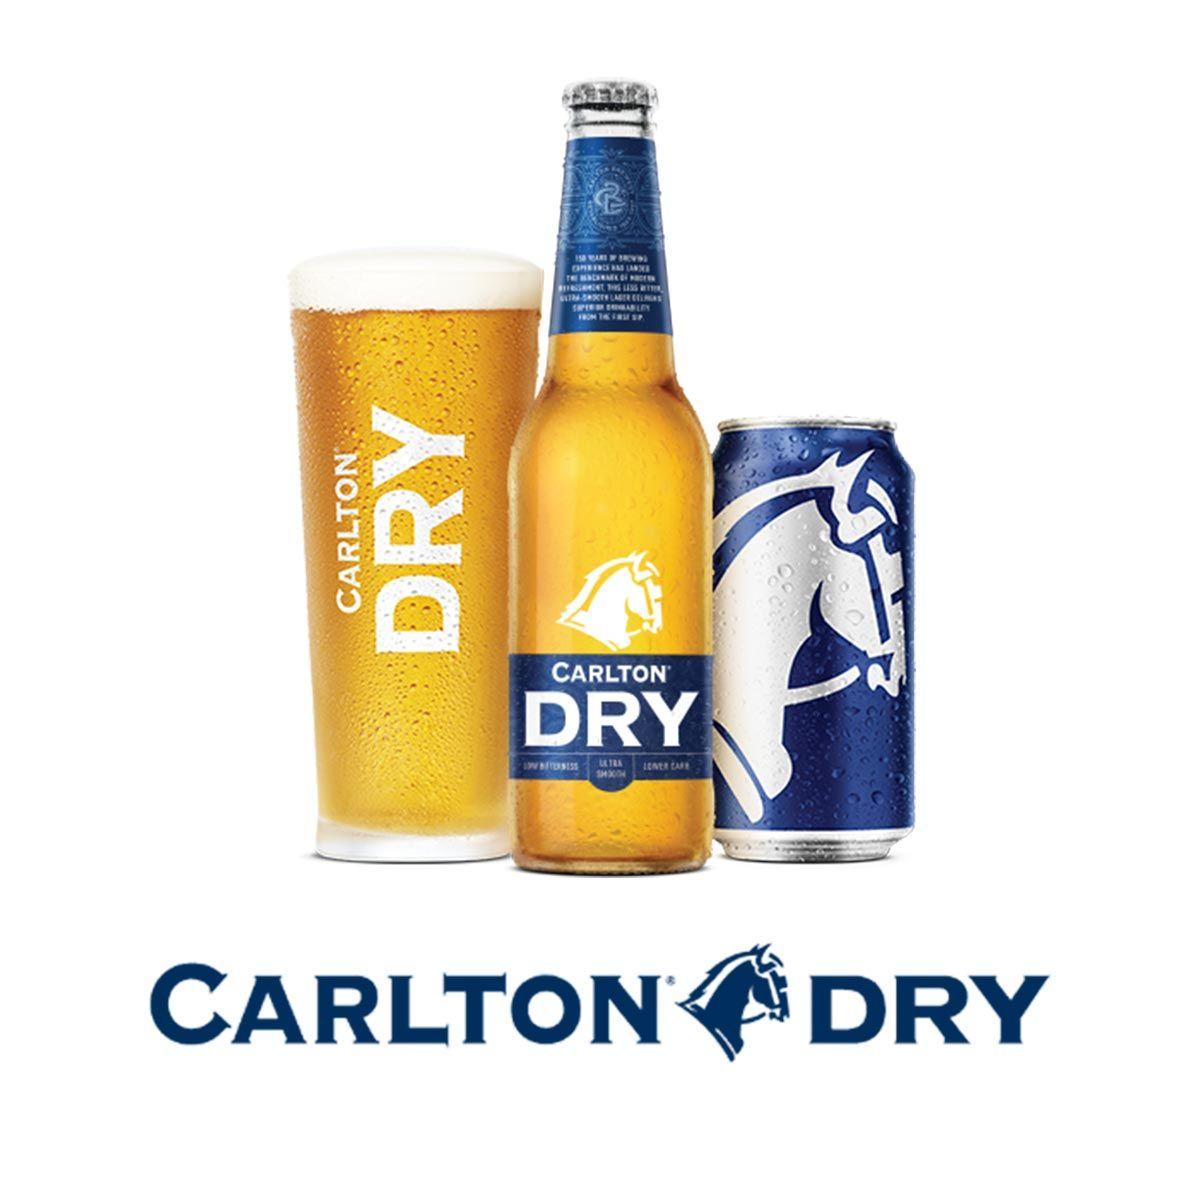 [REVIEW] Carlton Dry Packaging Update